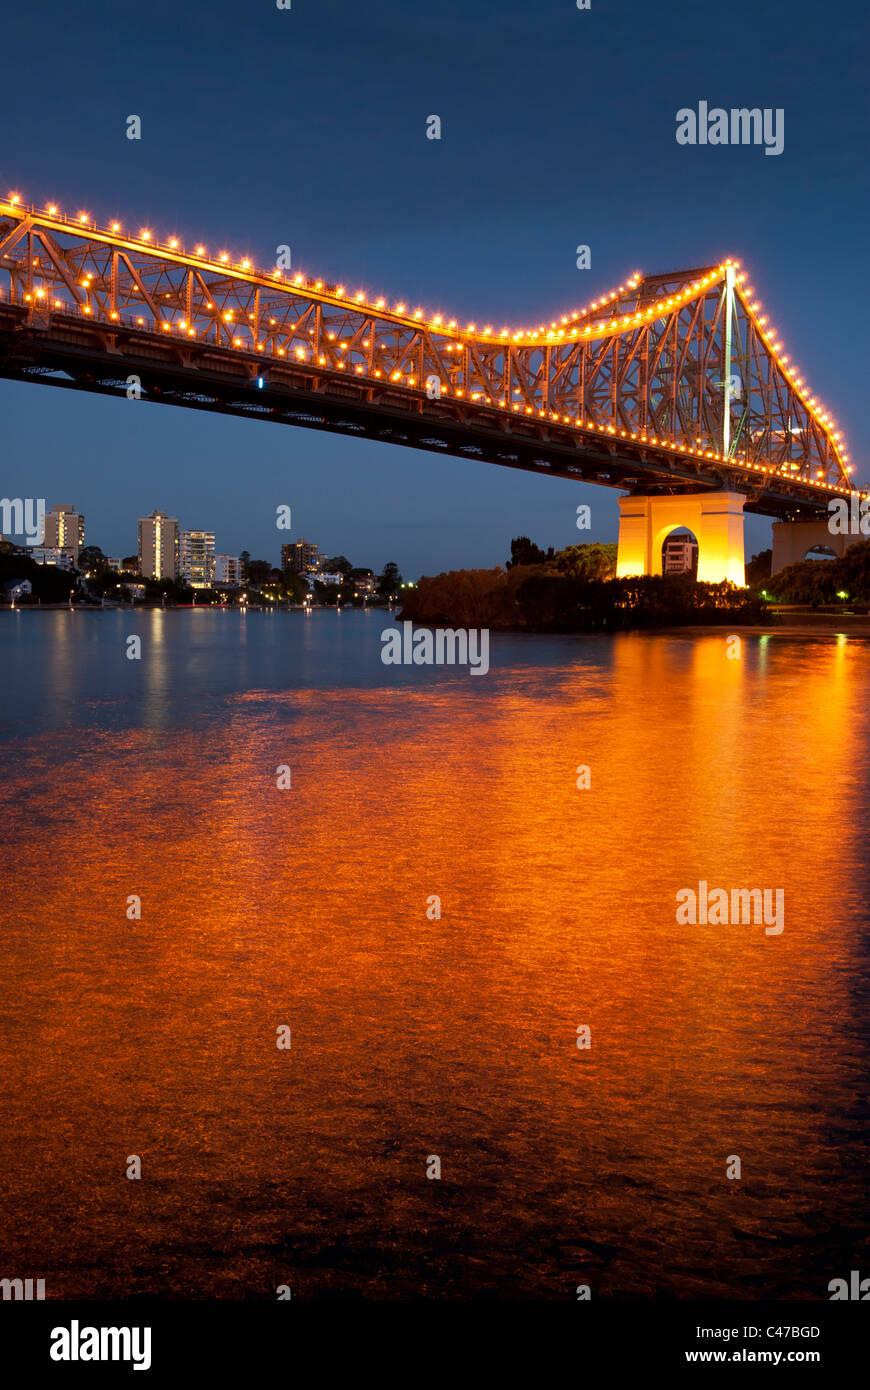 Brisbane Story Bridge at night Photo Stock